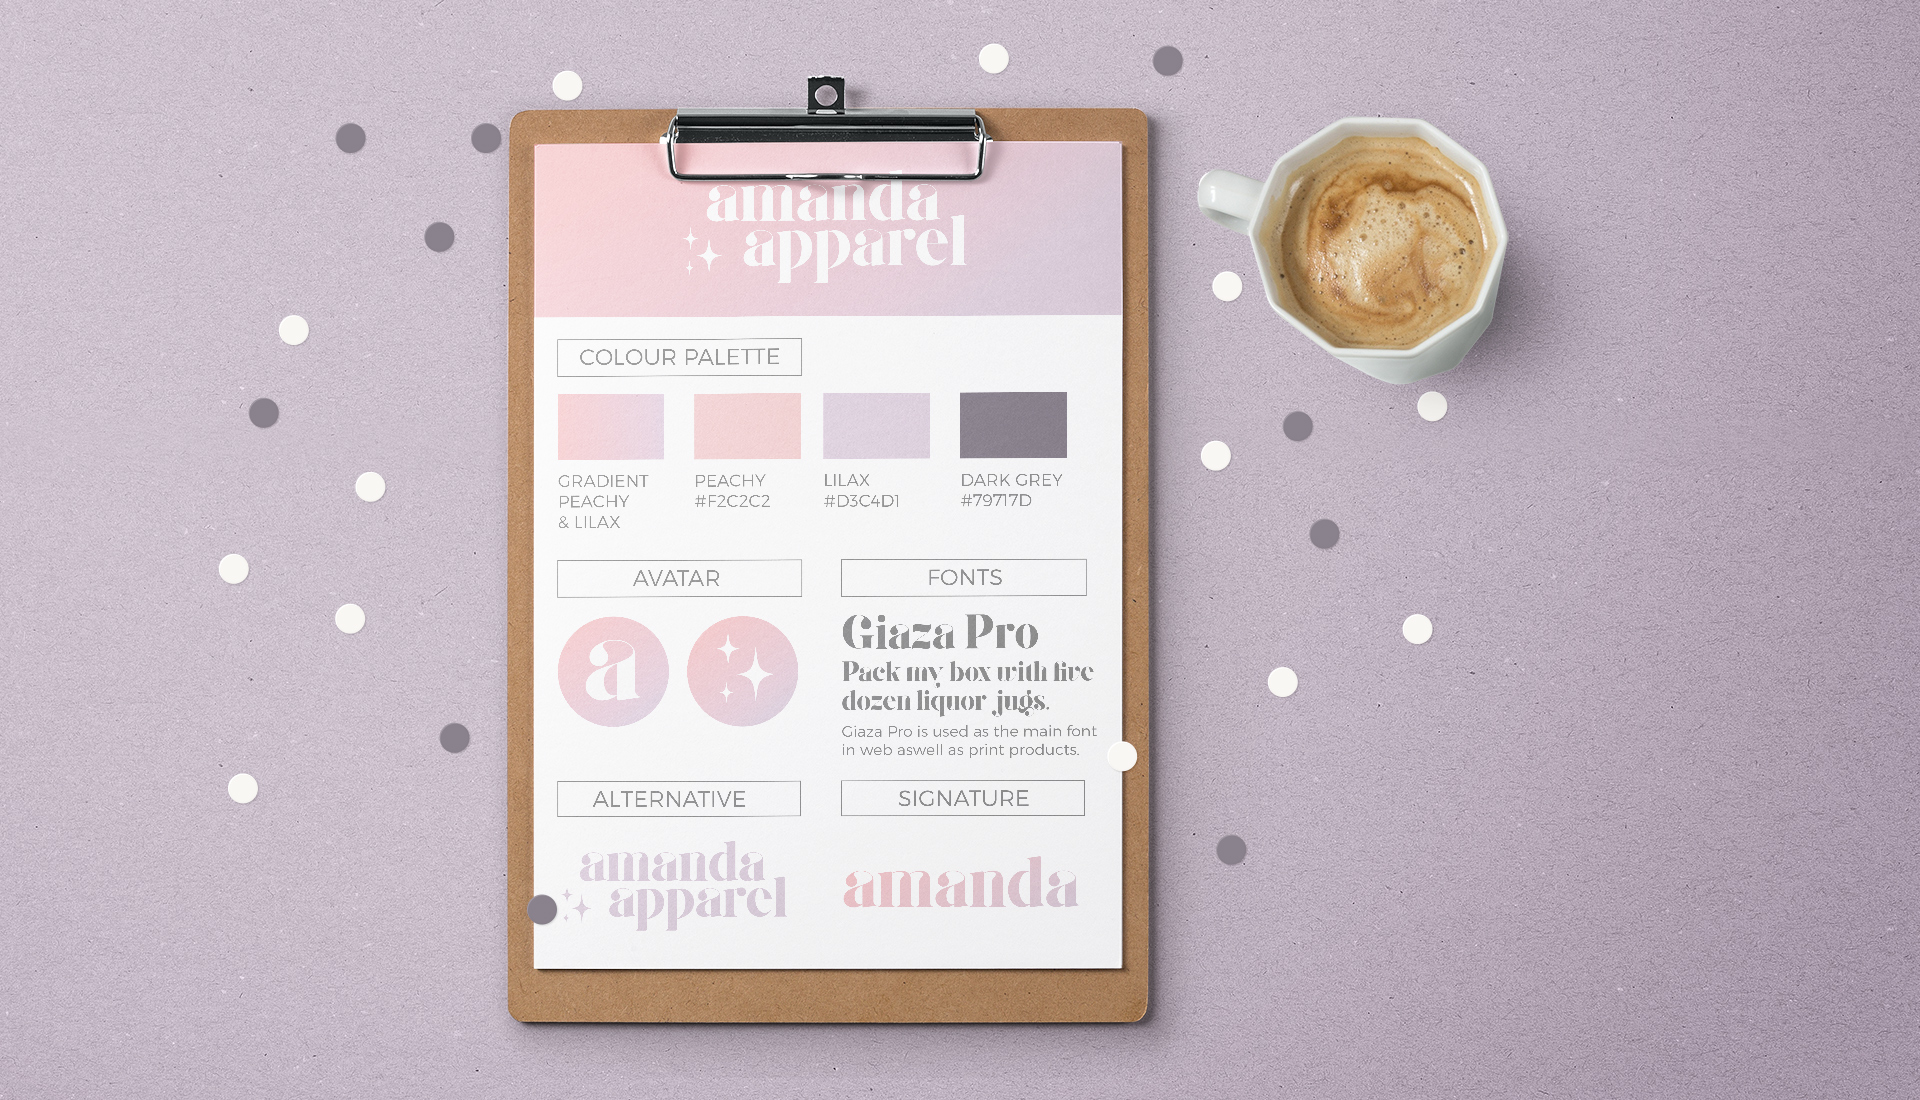 Clipboard shows the stylesheet for Amanda Apparels blog logo